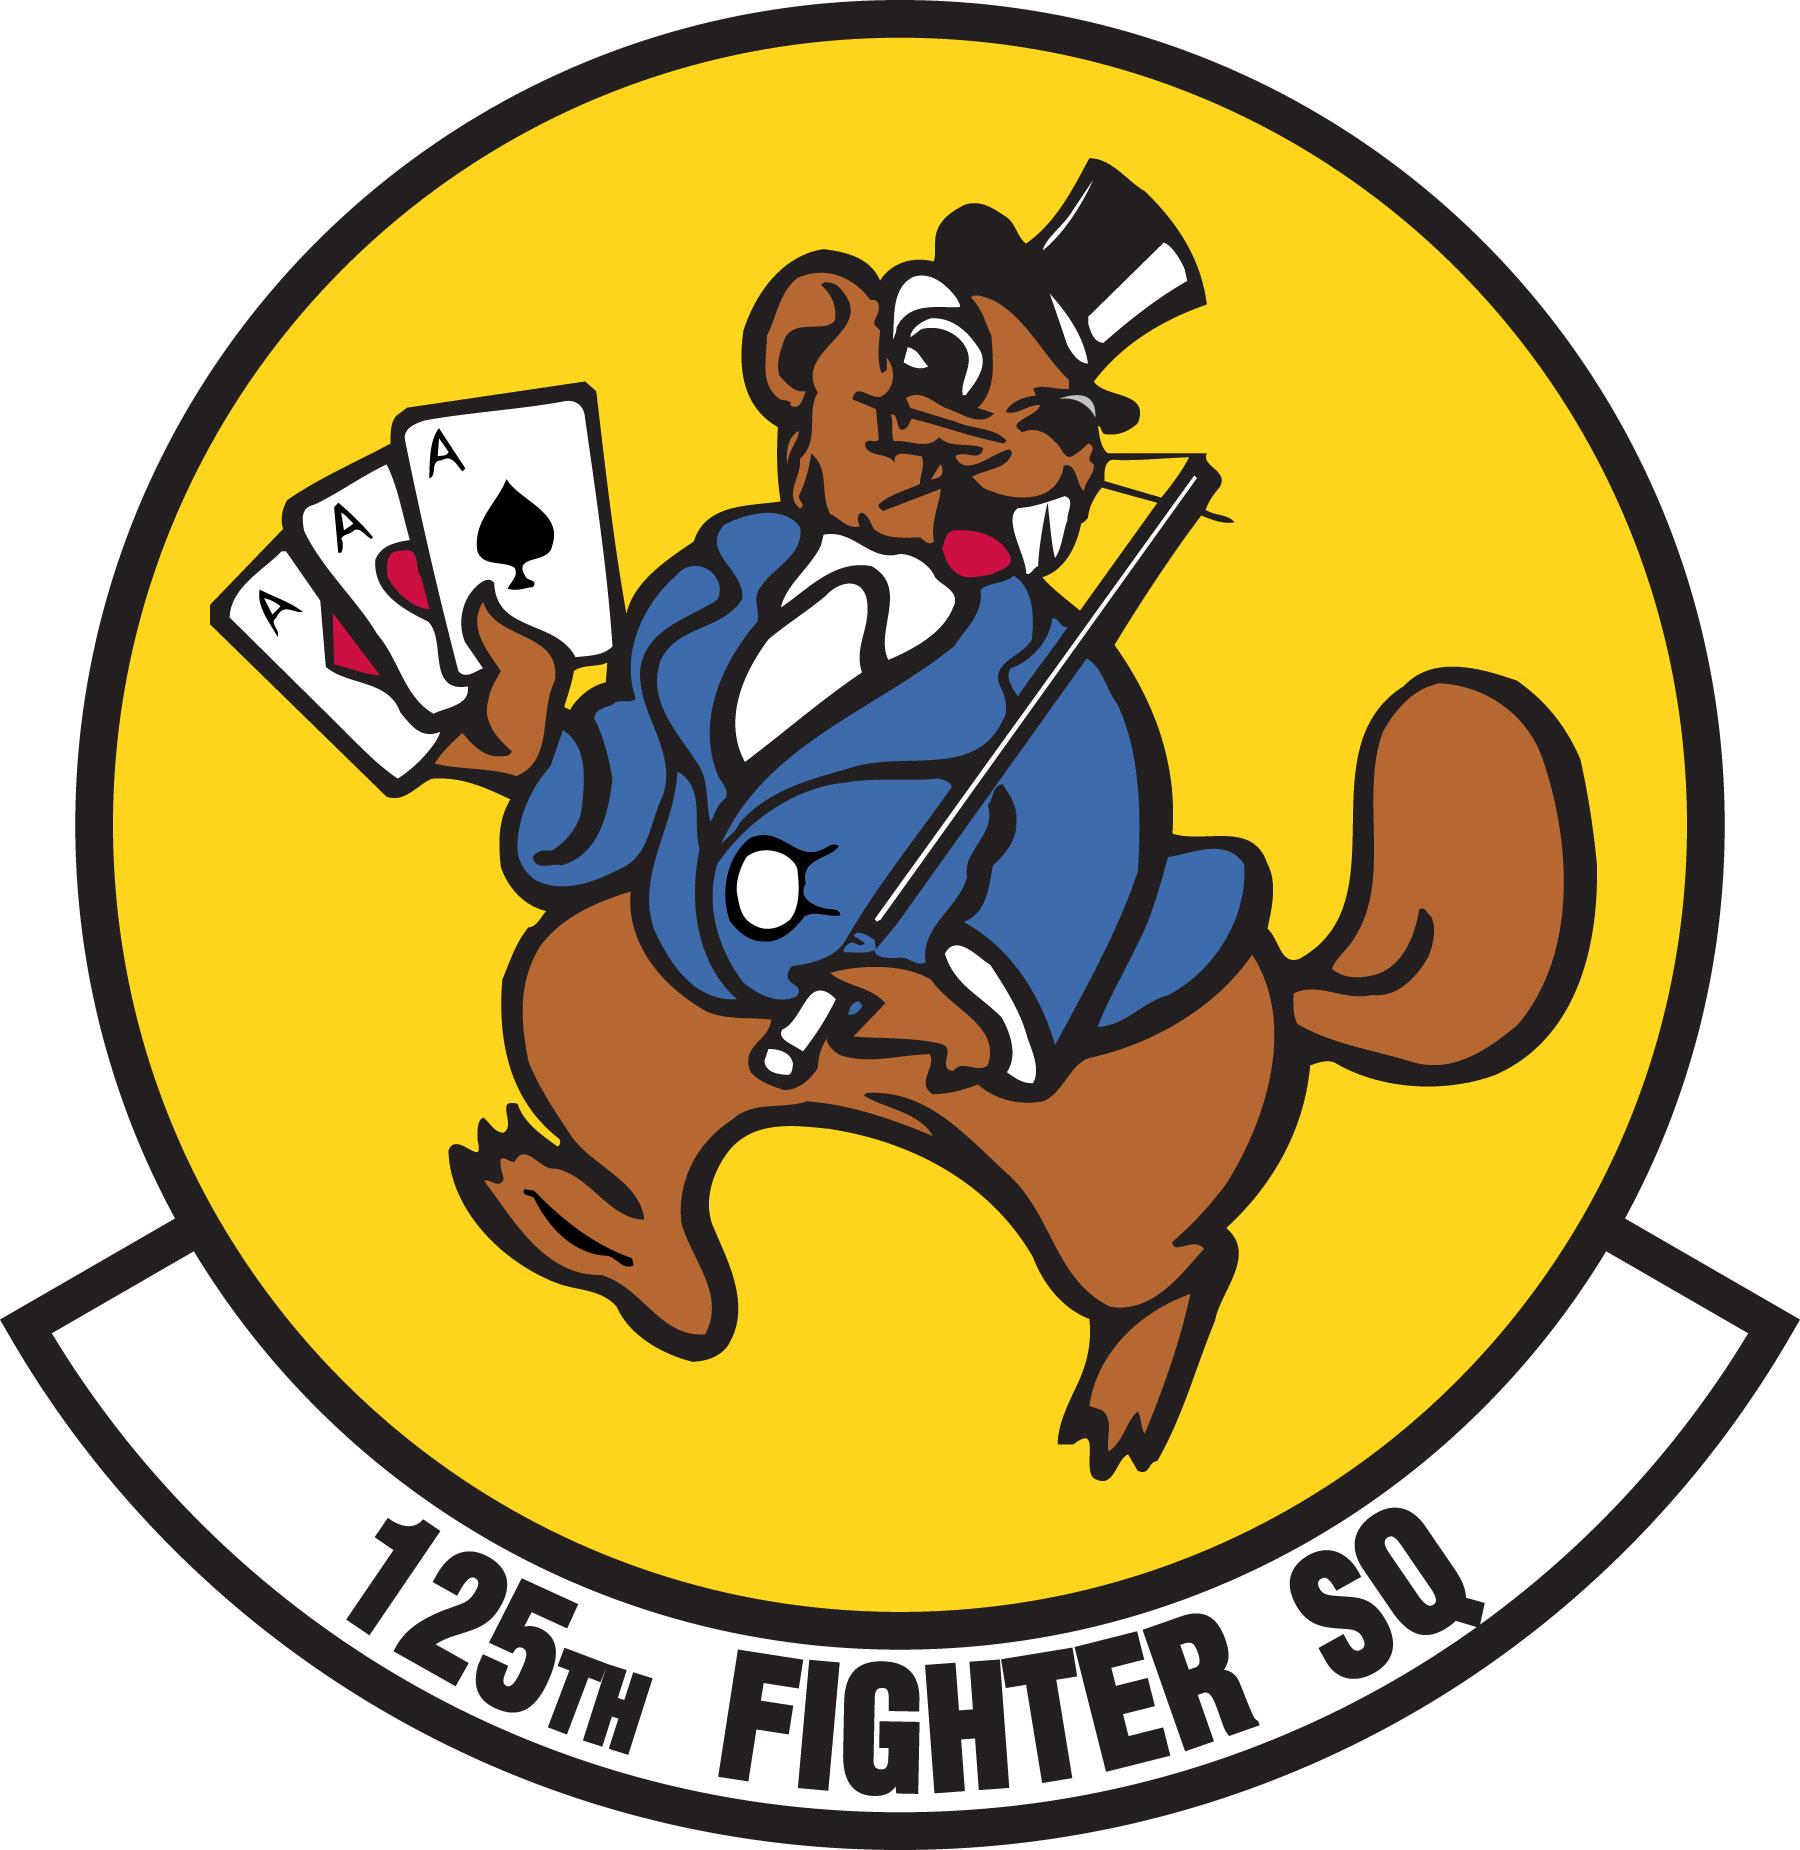 Fighter Squadron Logos File:125th Fighter Squadron